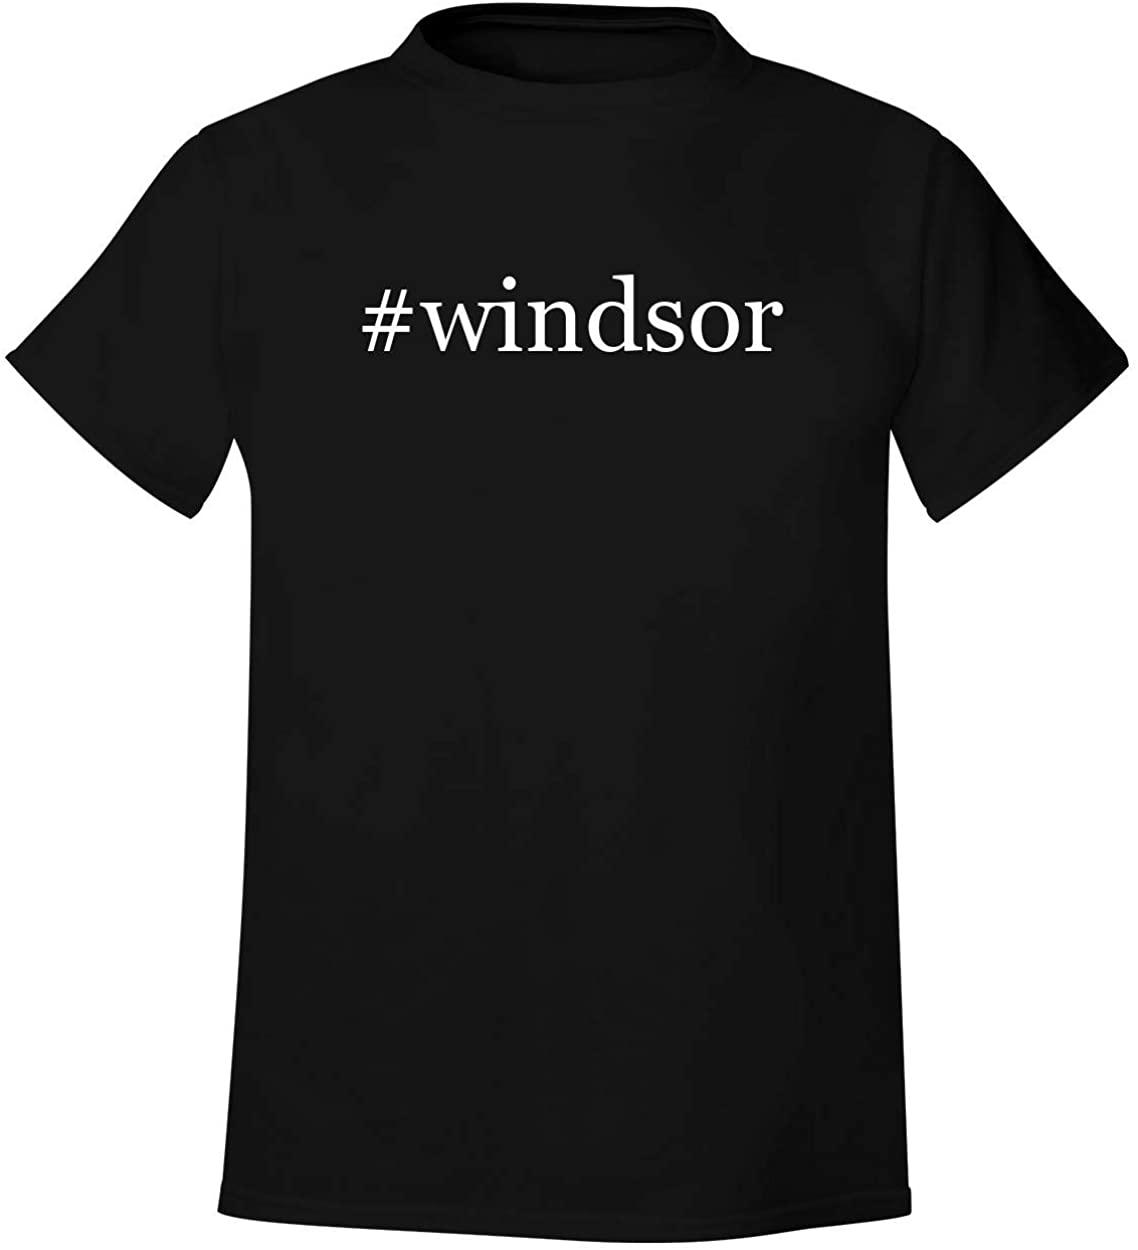 #windsor - Men's Hashtag Soft & Comfortable T-Shirt